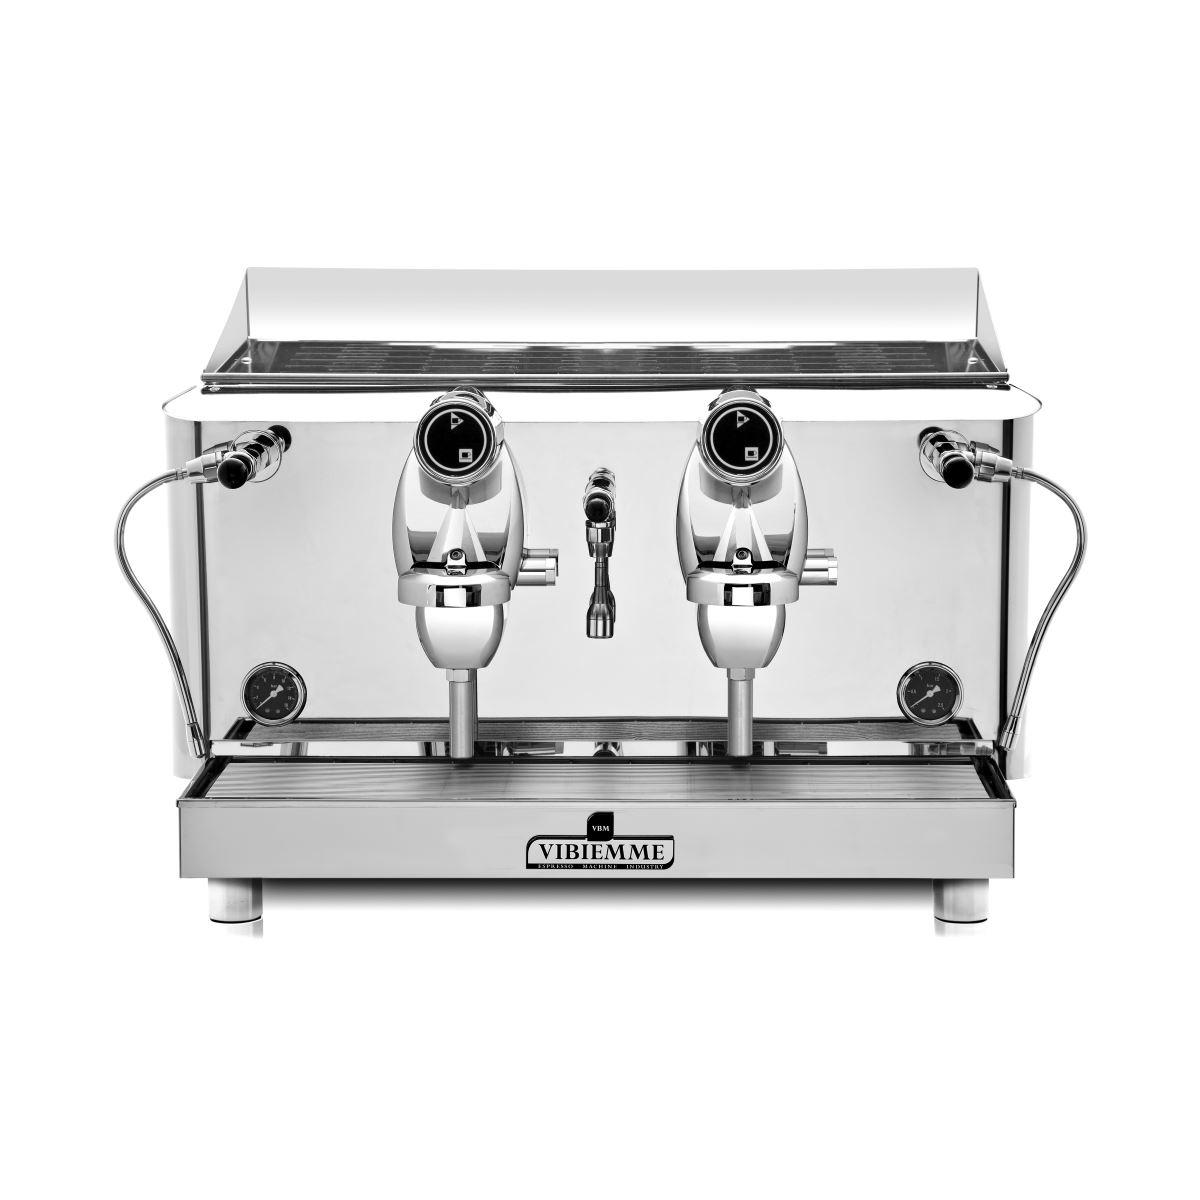 Espressor profesional Vibiemme Lollo Semiautomatica, 2 grupuri